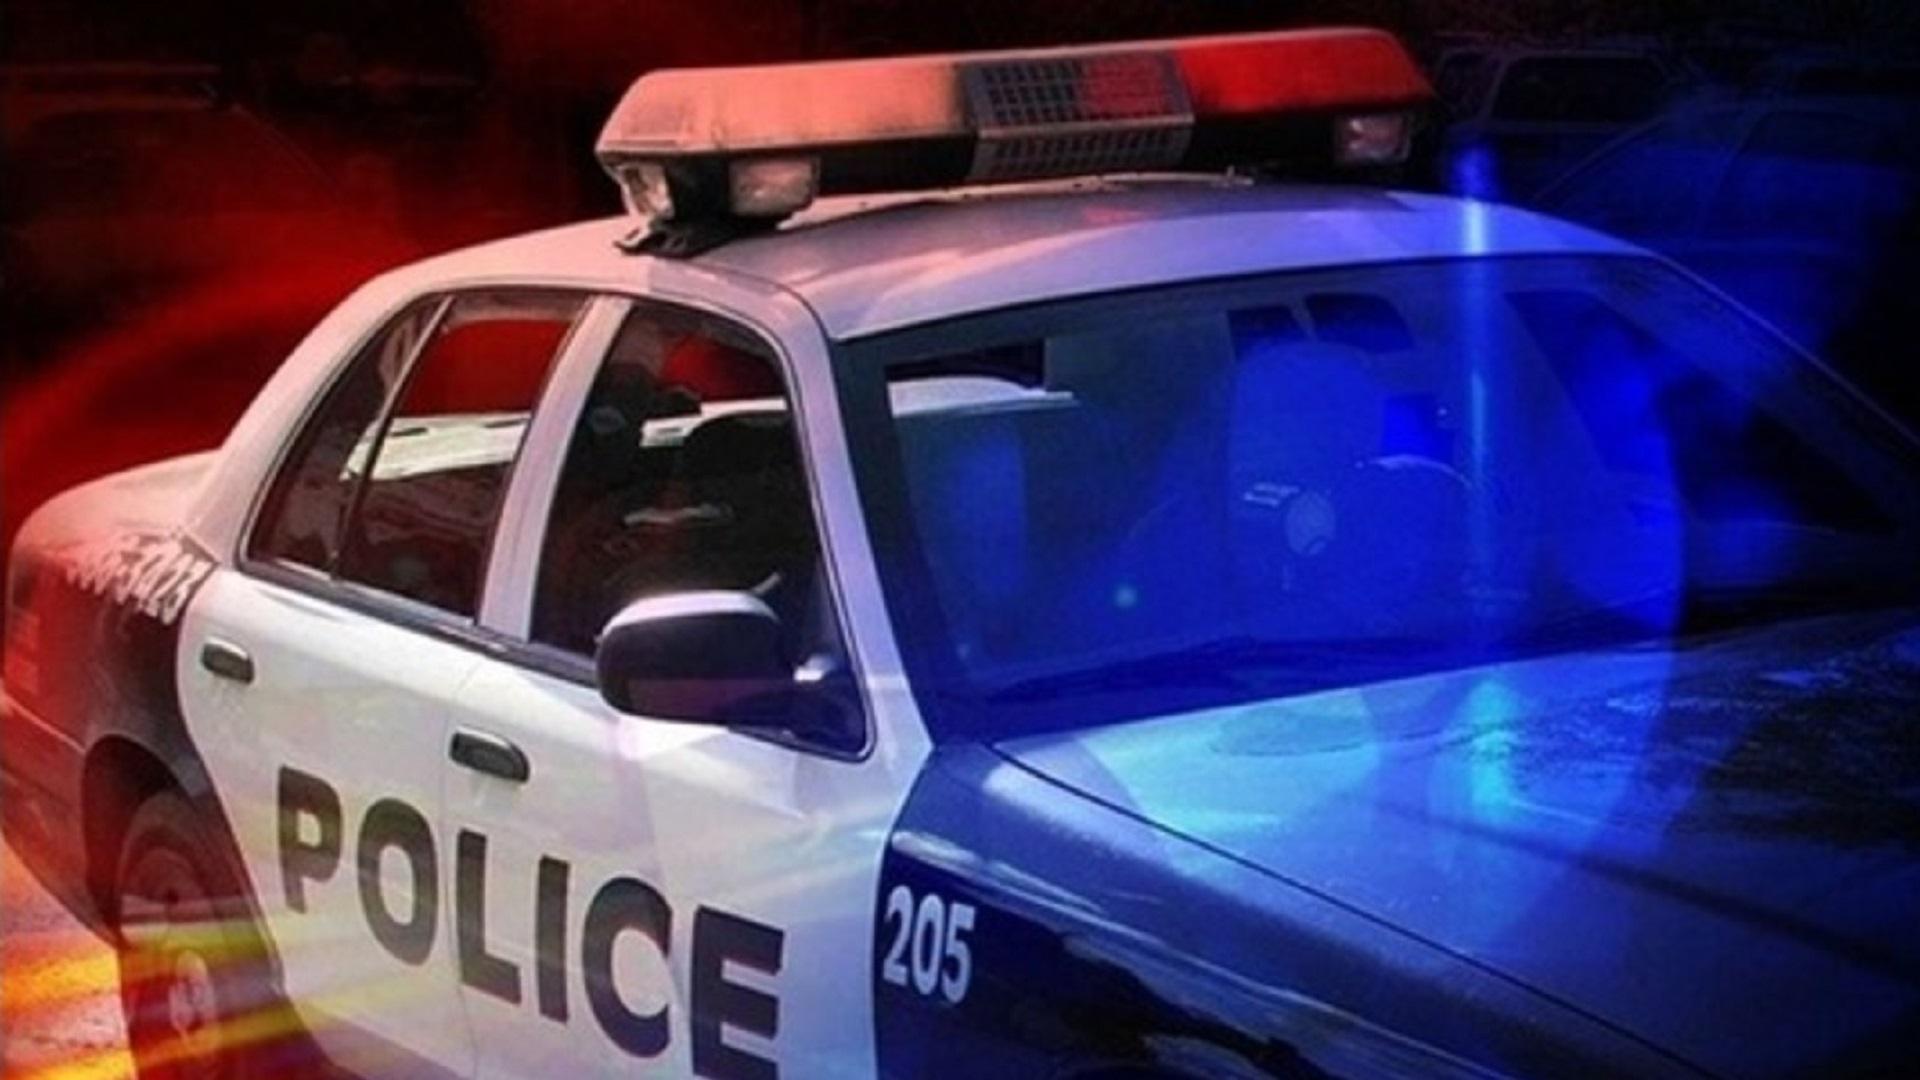 police car_1550152760010.jpg.jpg